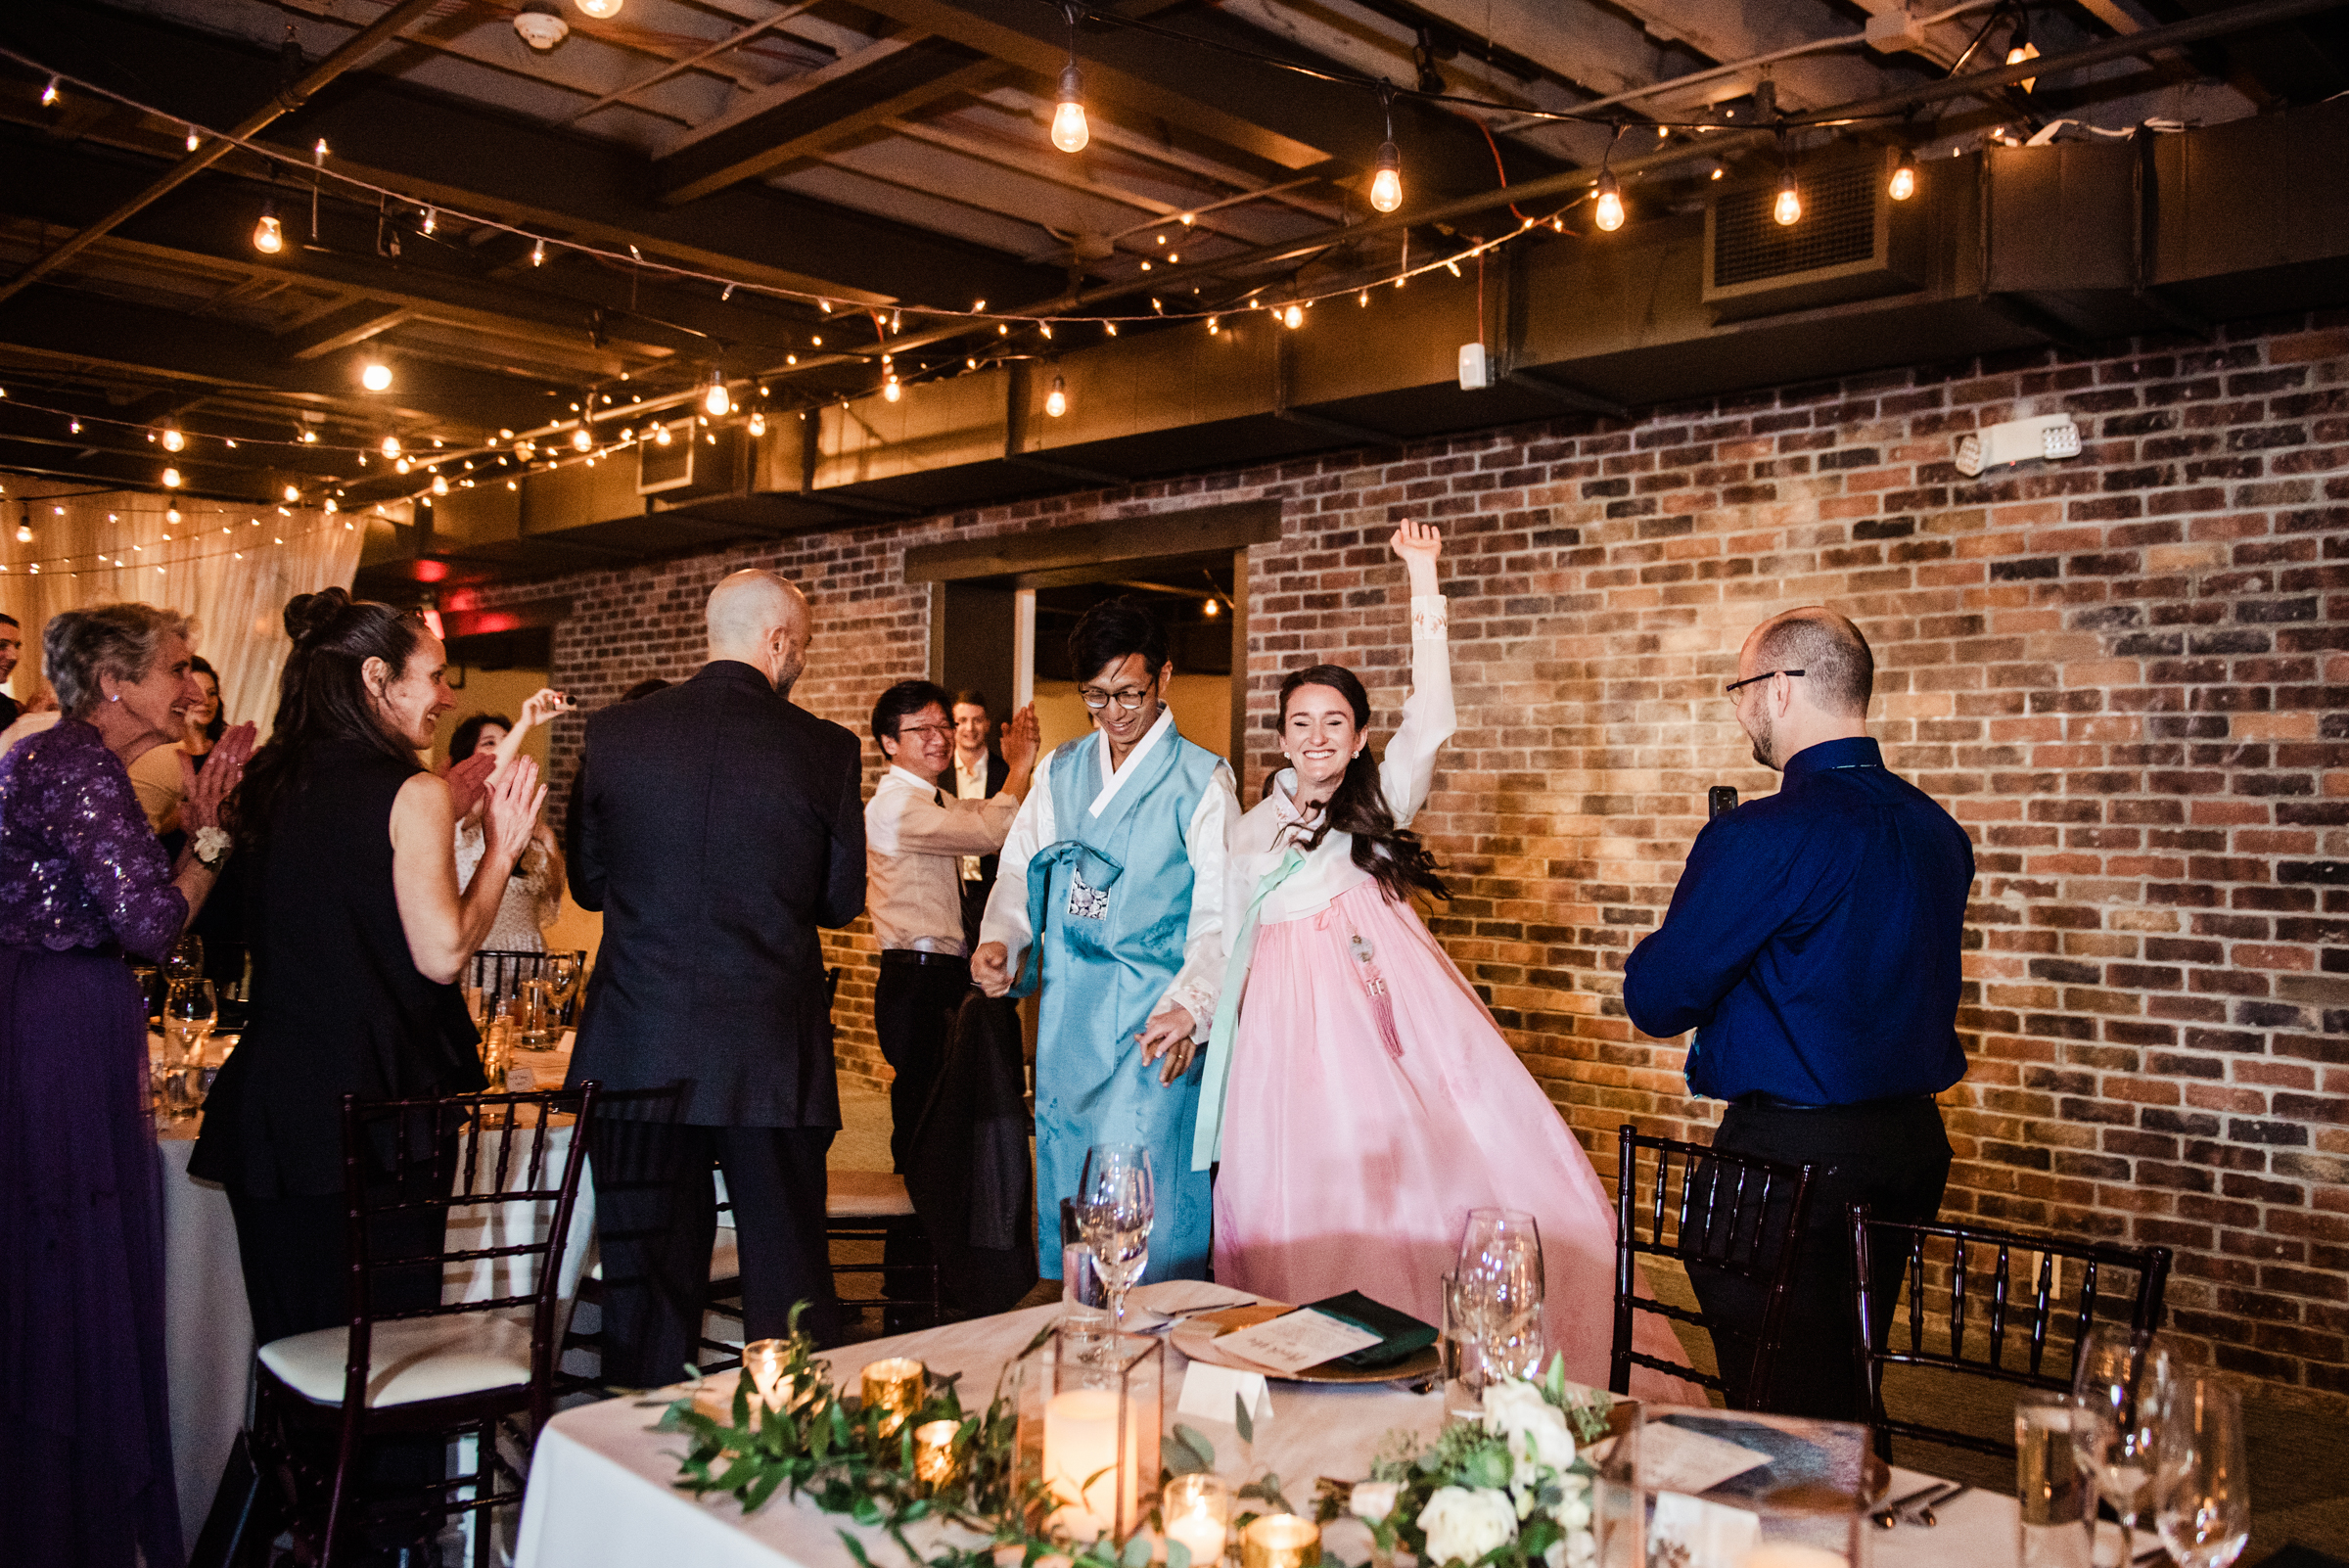 SKY_Armory_Syracuse_Wedding_JILL_STUDIO_Rochester_NY_Photographer_DSC_6120.jpg